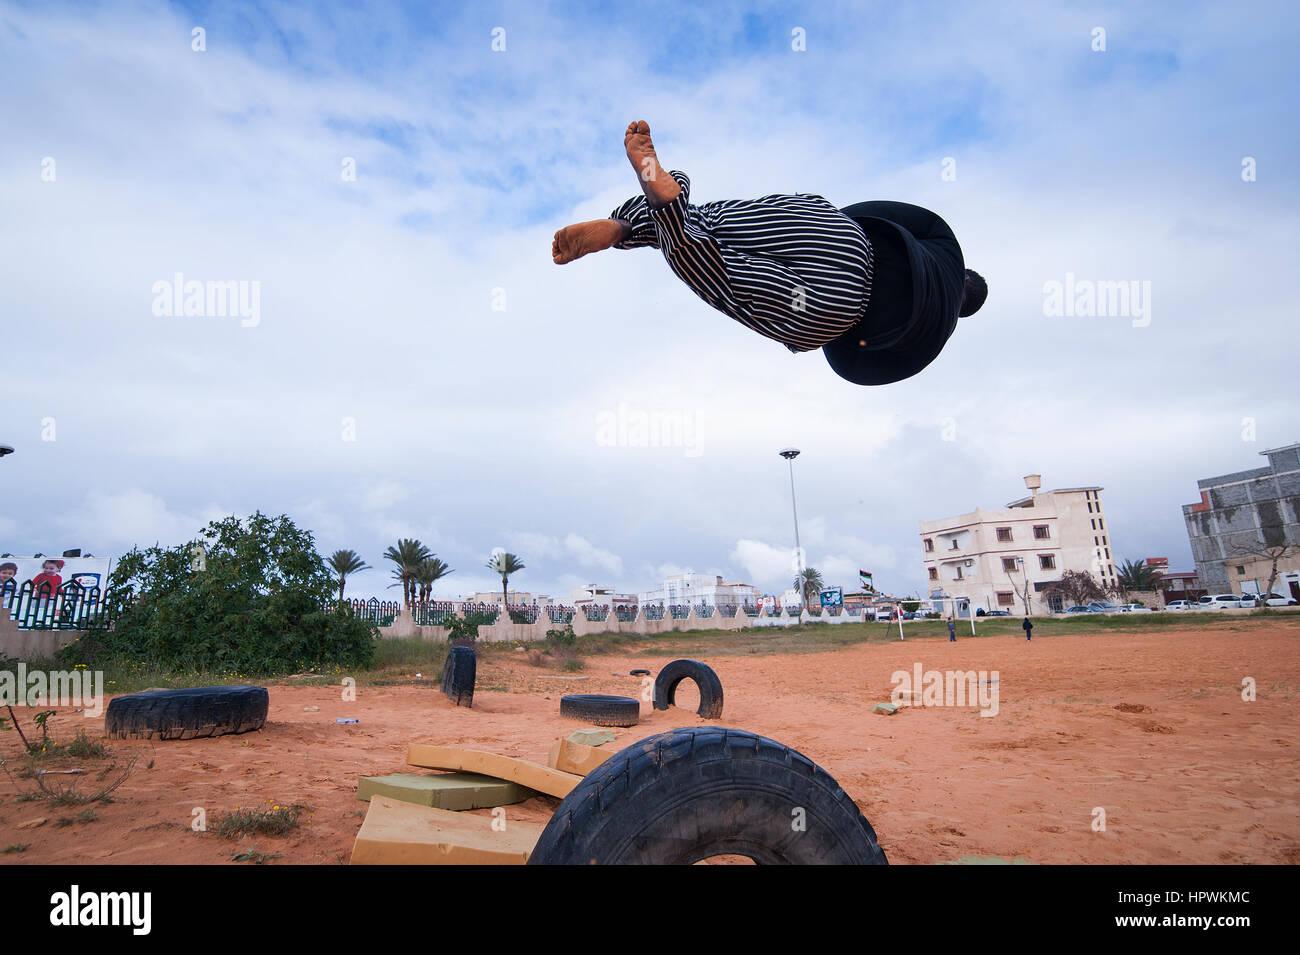 Libya, Tripli: Young guys practising parkour moves. - Stock Image